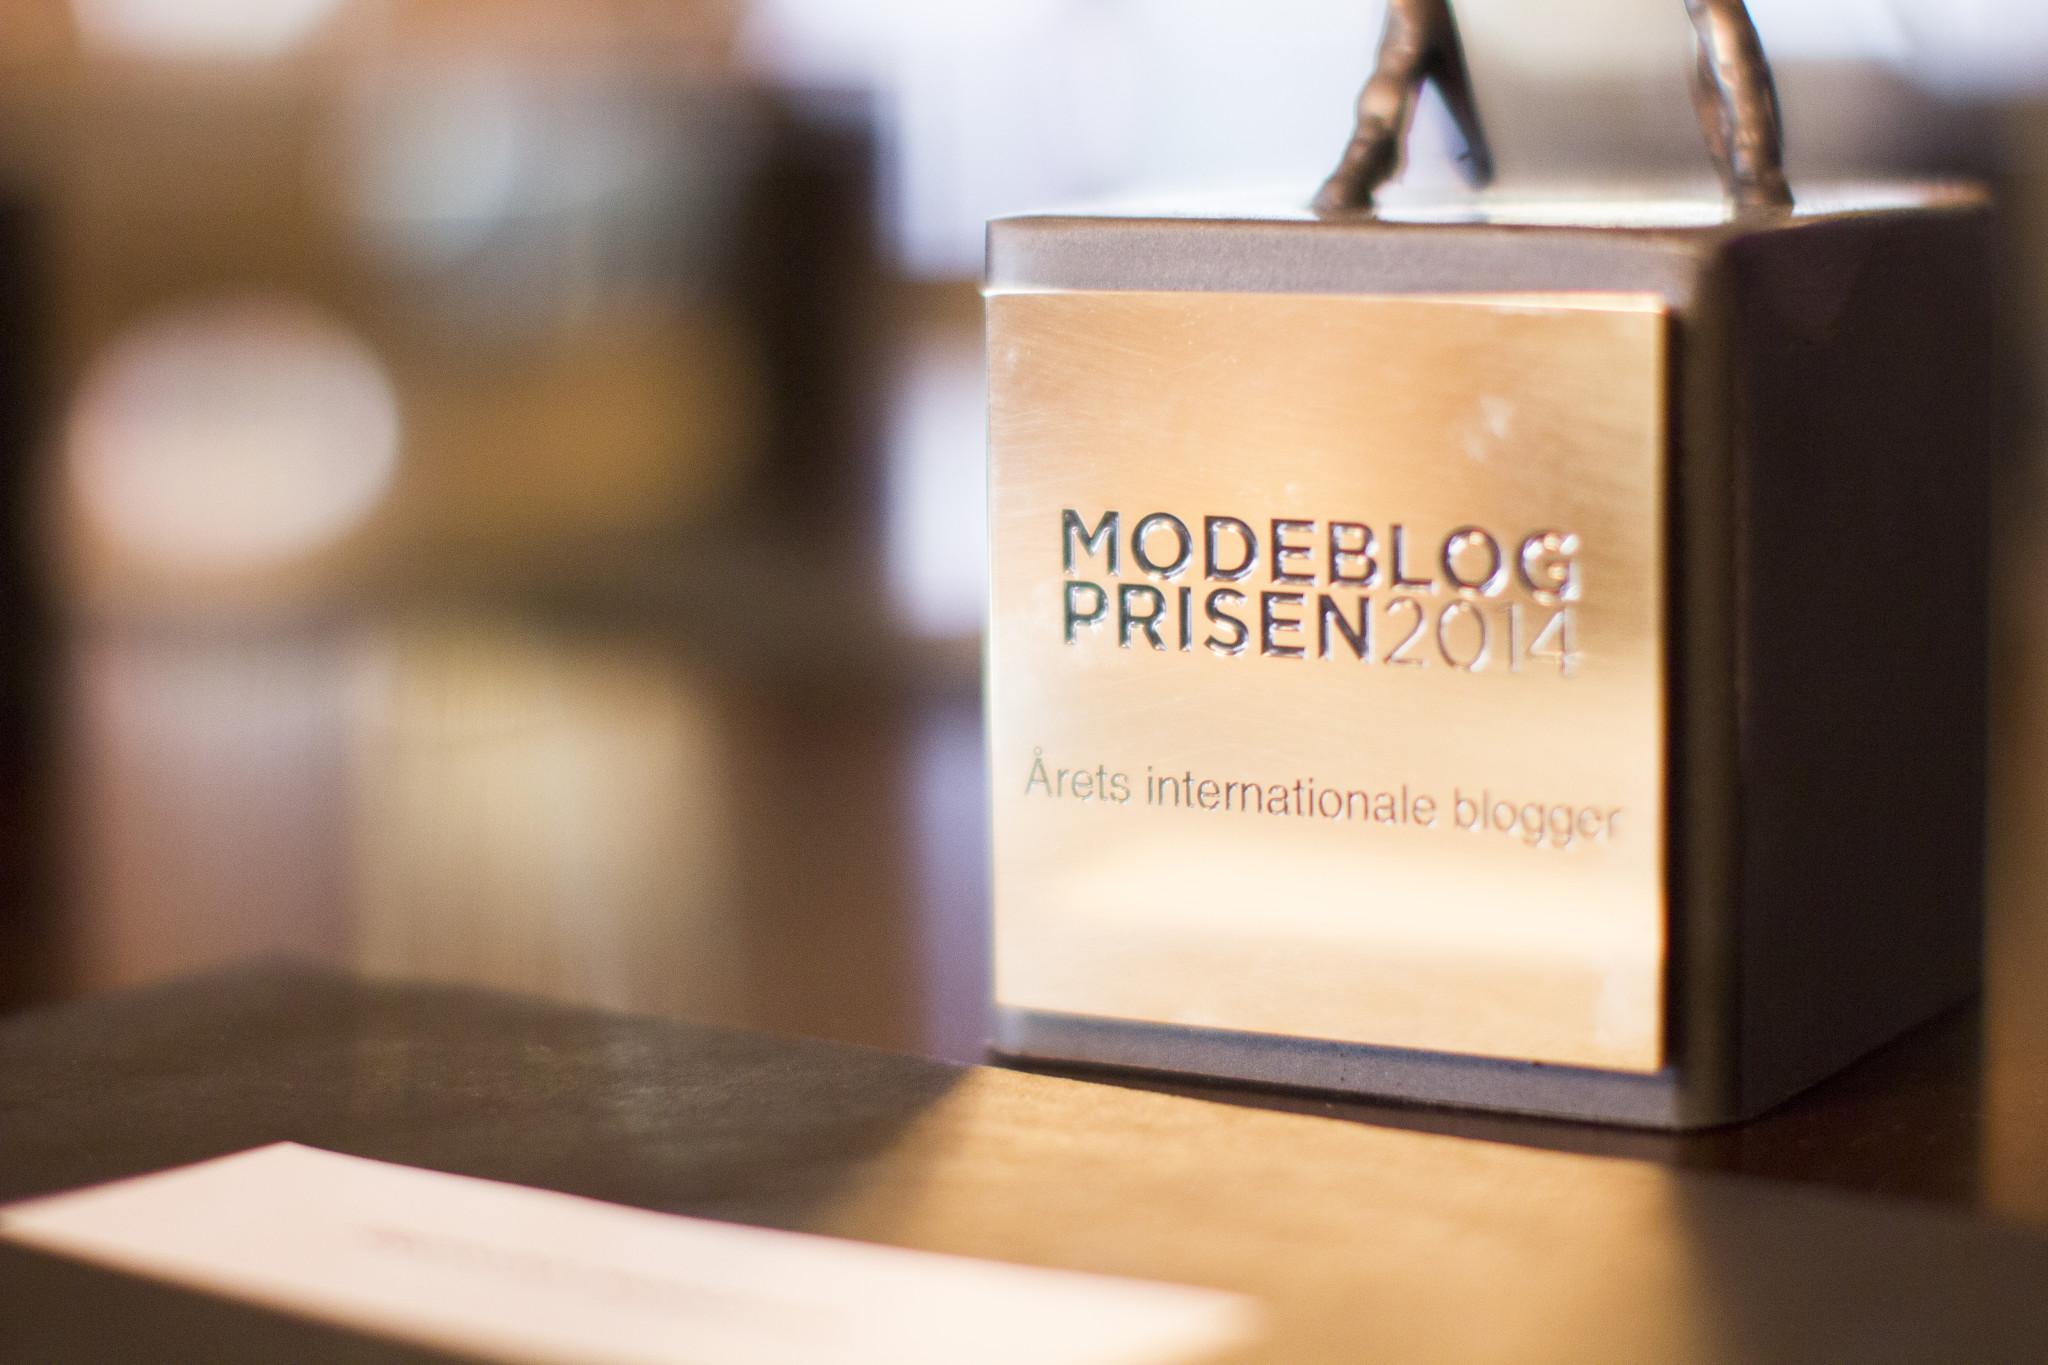 Modeblogprisen 2014 hylder en ny levedygtig forretning